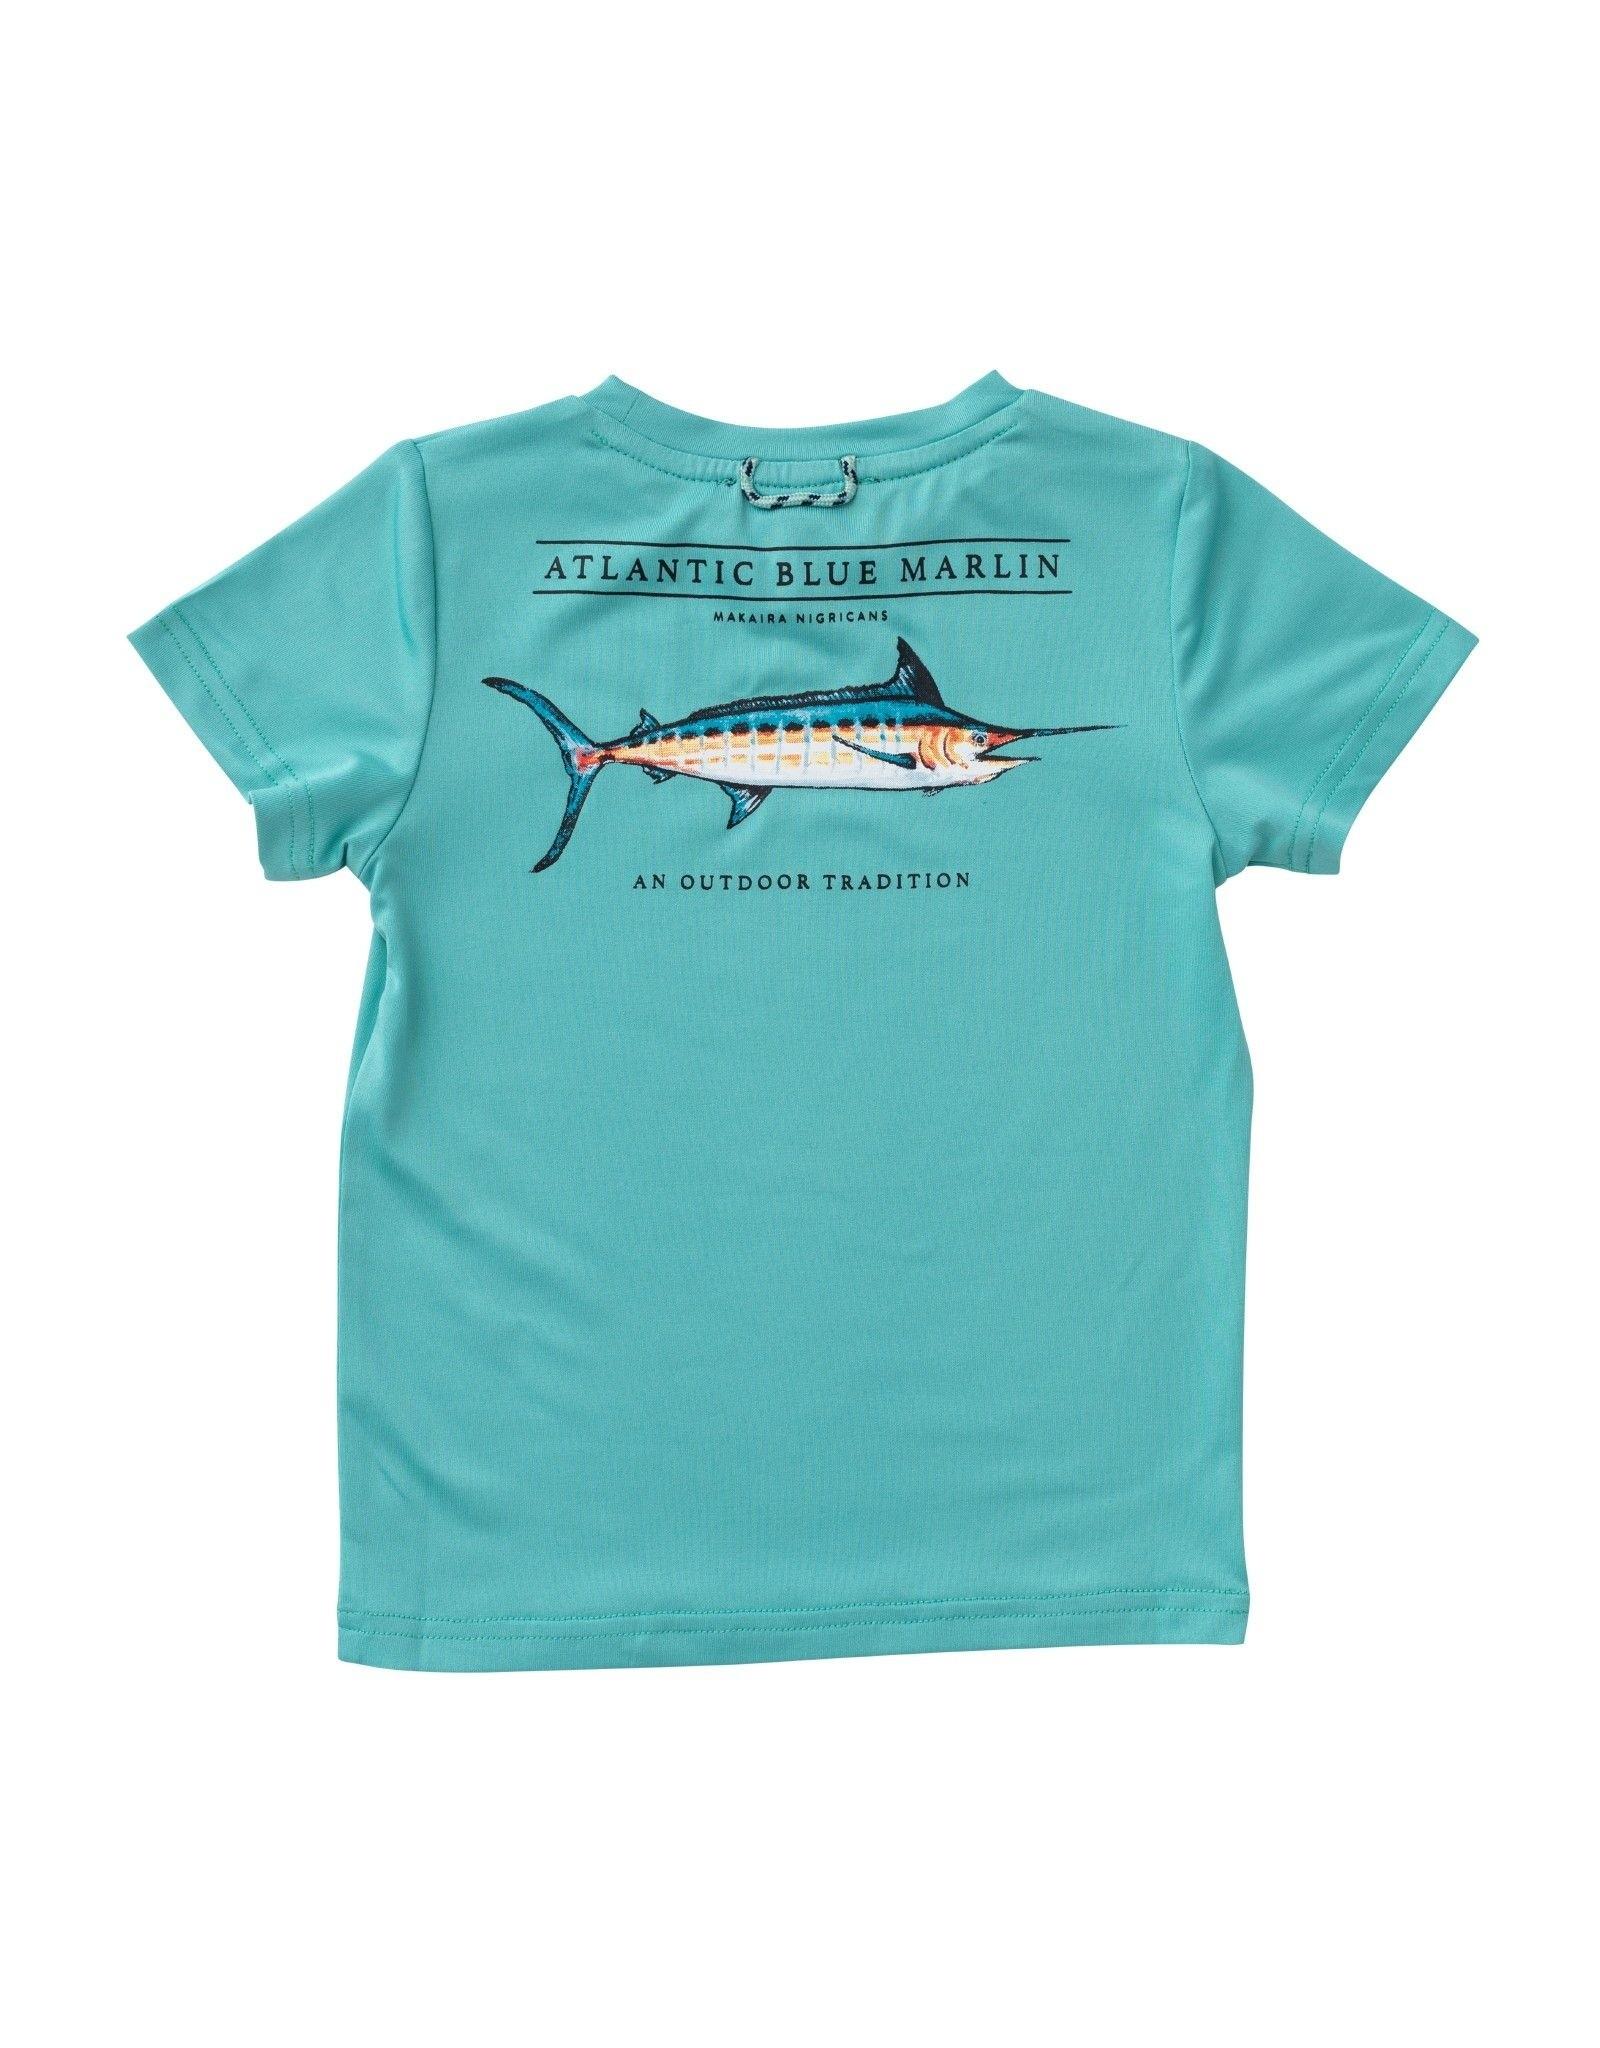 Prodoh Blue Marlin Performance Tee- PREORDER